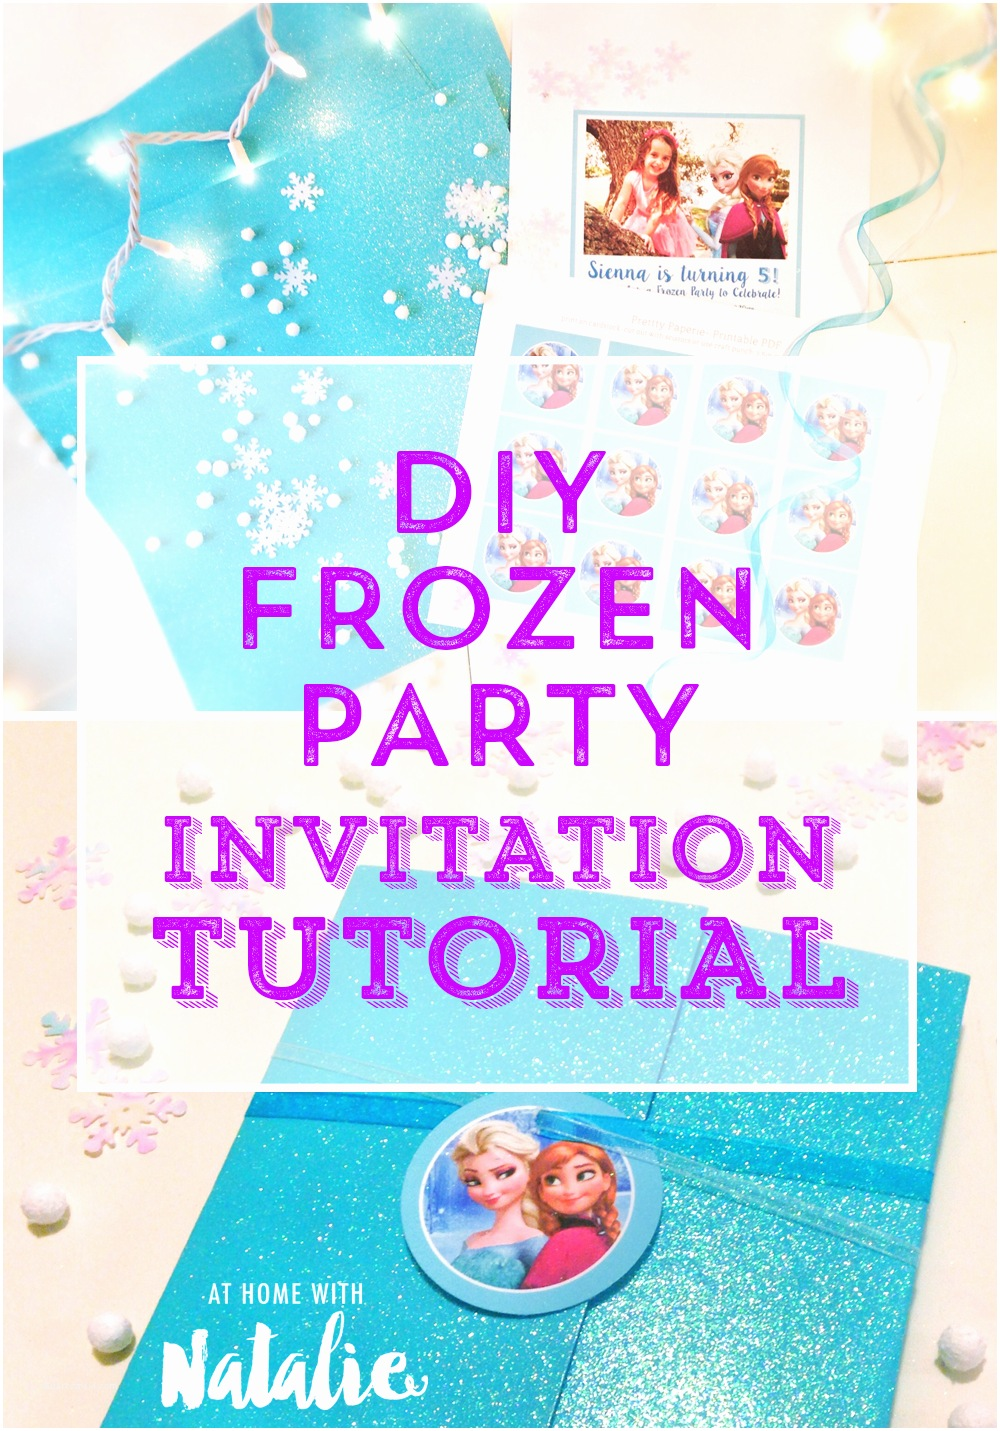 Frozen Birthday Invitation Diy Frozen Party Invitation Tutorial Free Printable at